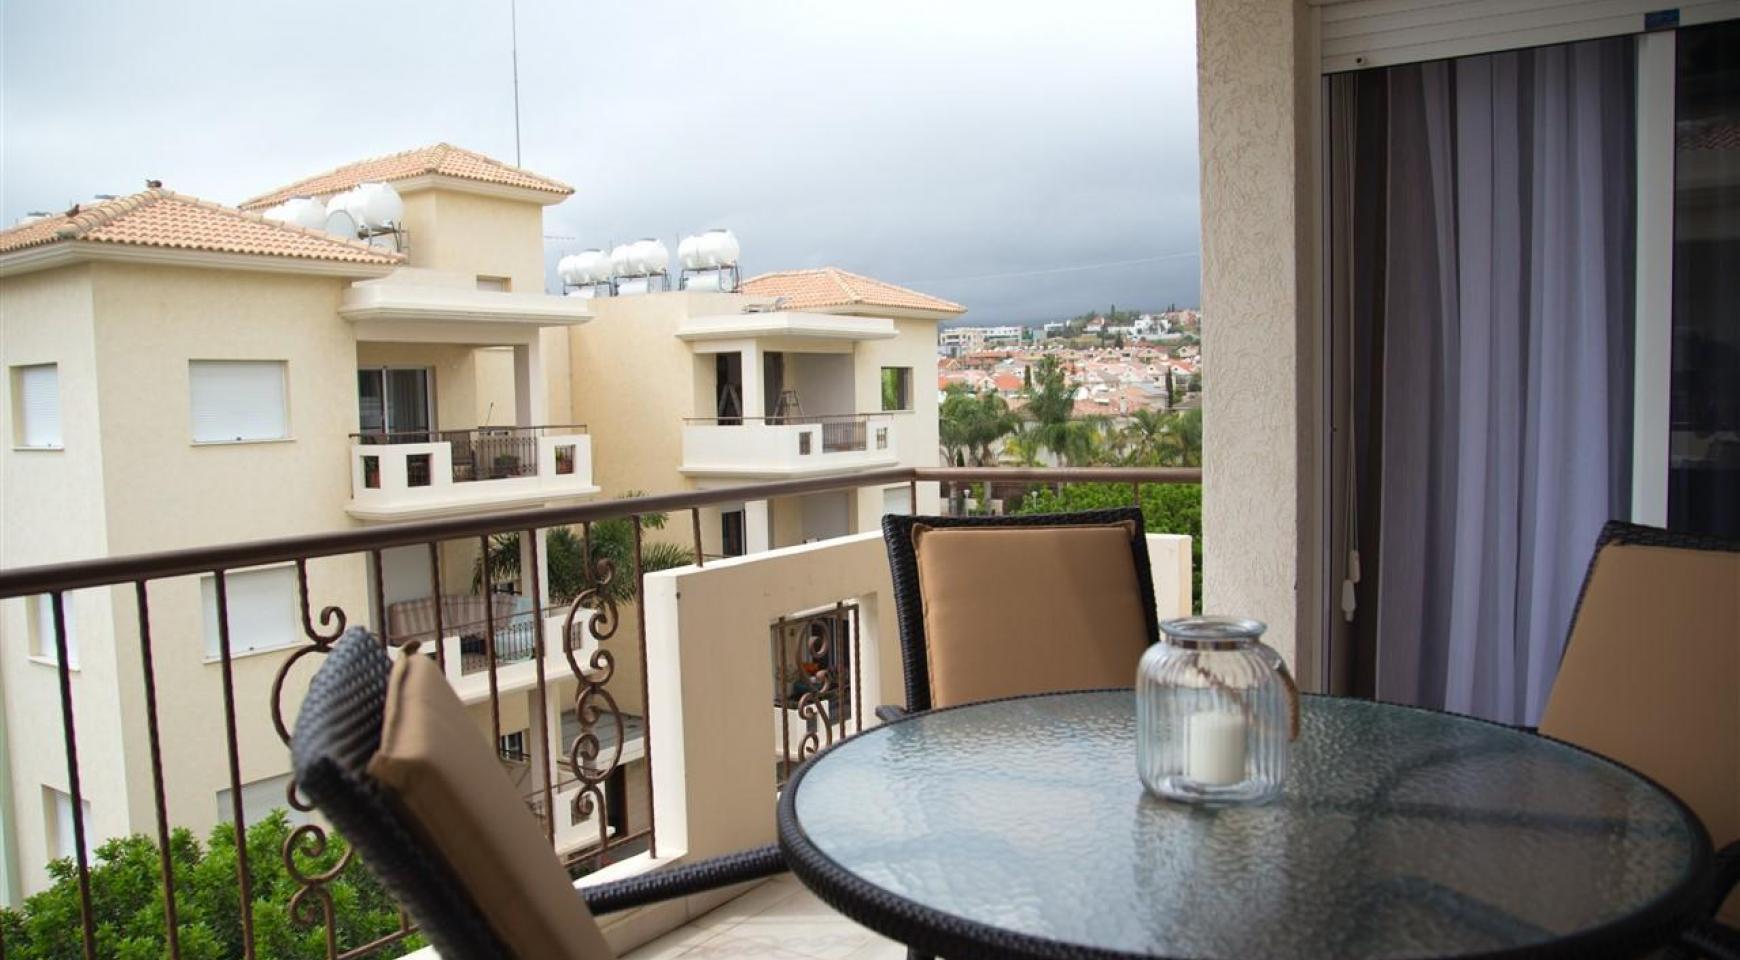 Luxury 2 Bedroom Apartment Mesogios Iris 304 in the Tourist area near the Beach - 24